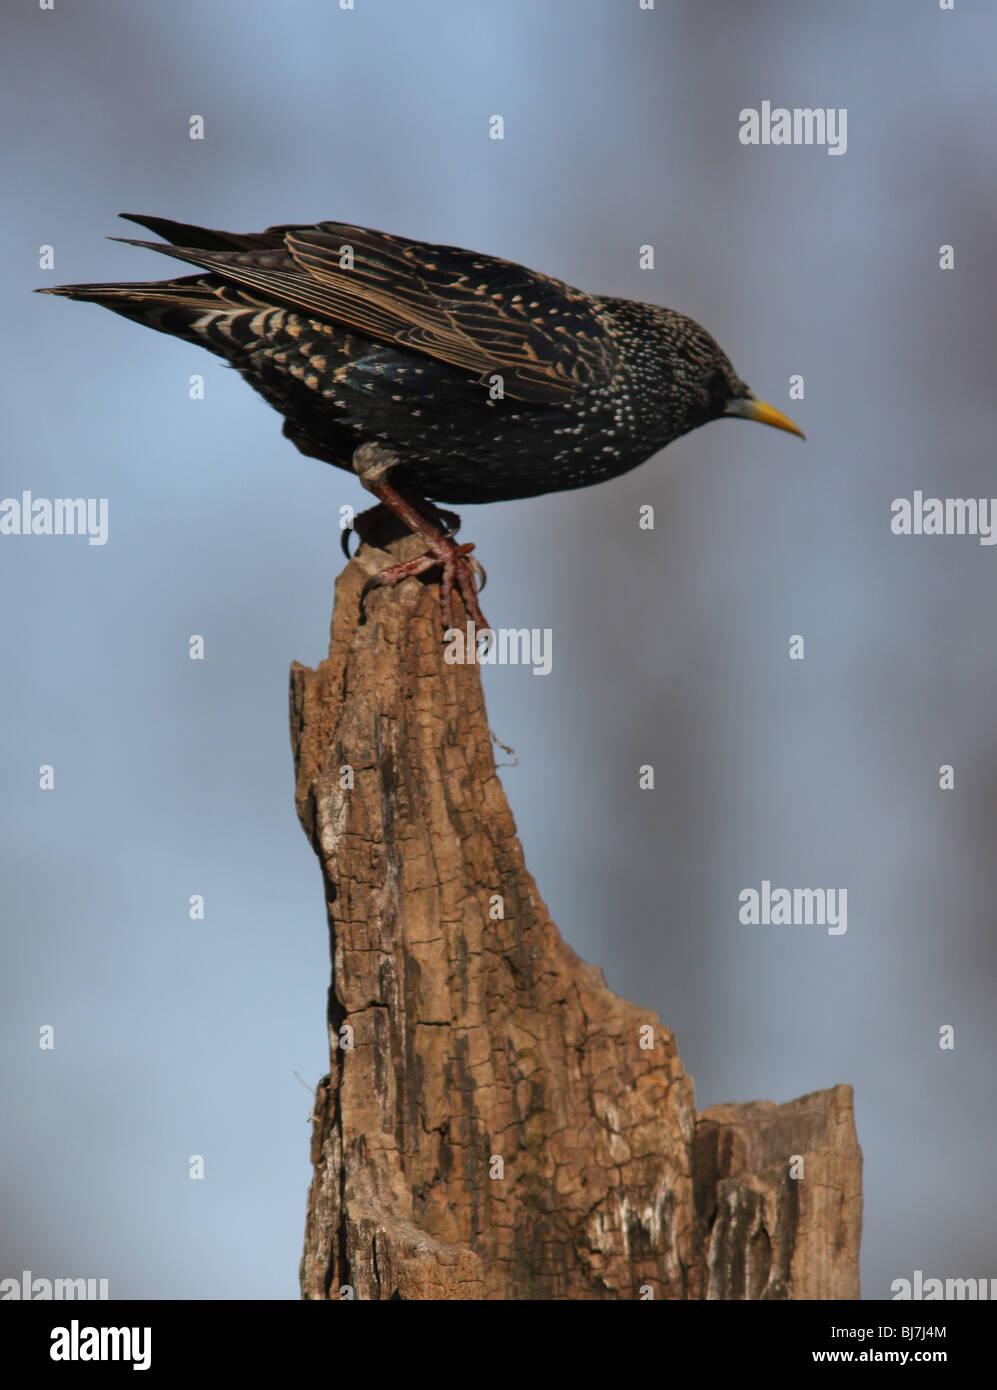 European starling feeder - Stock Image